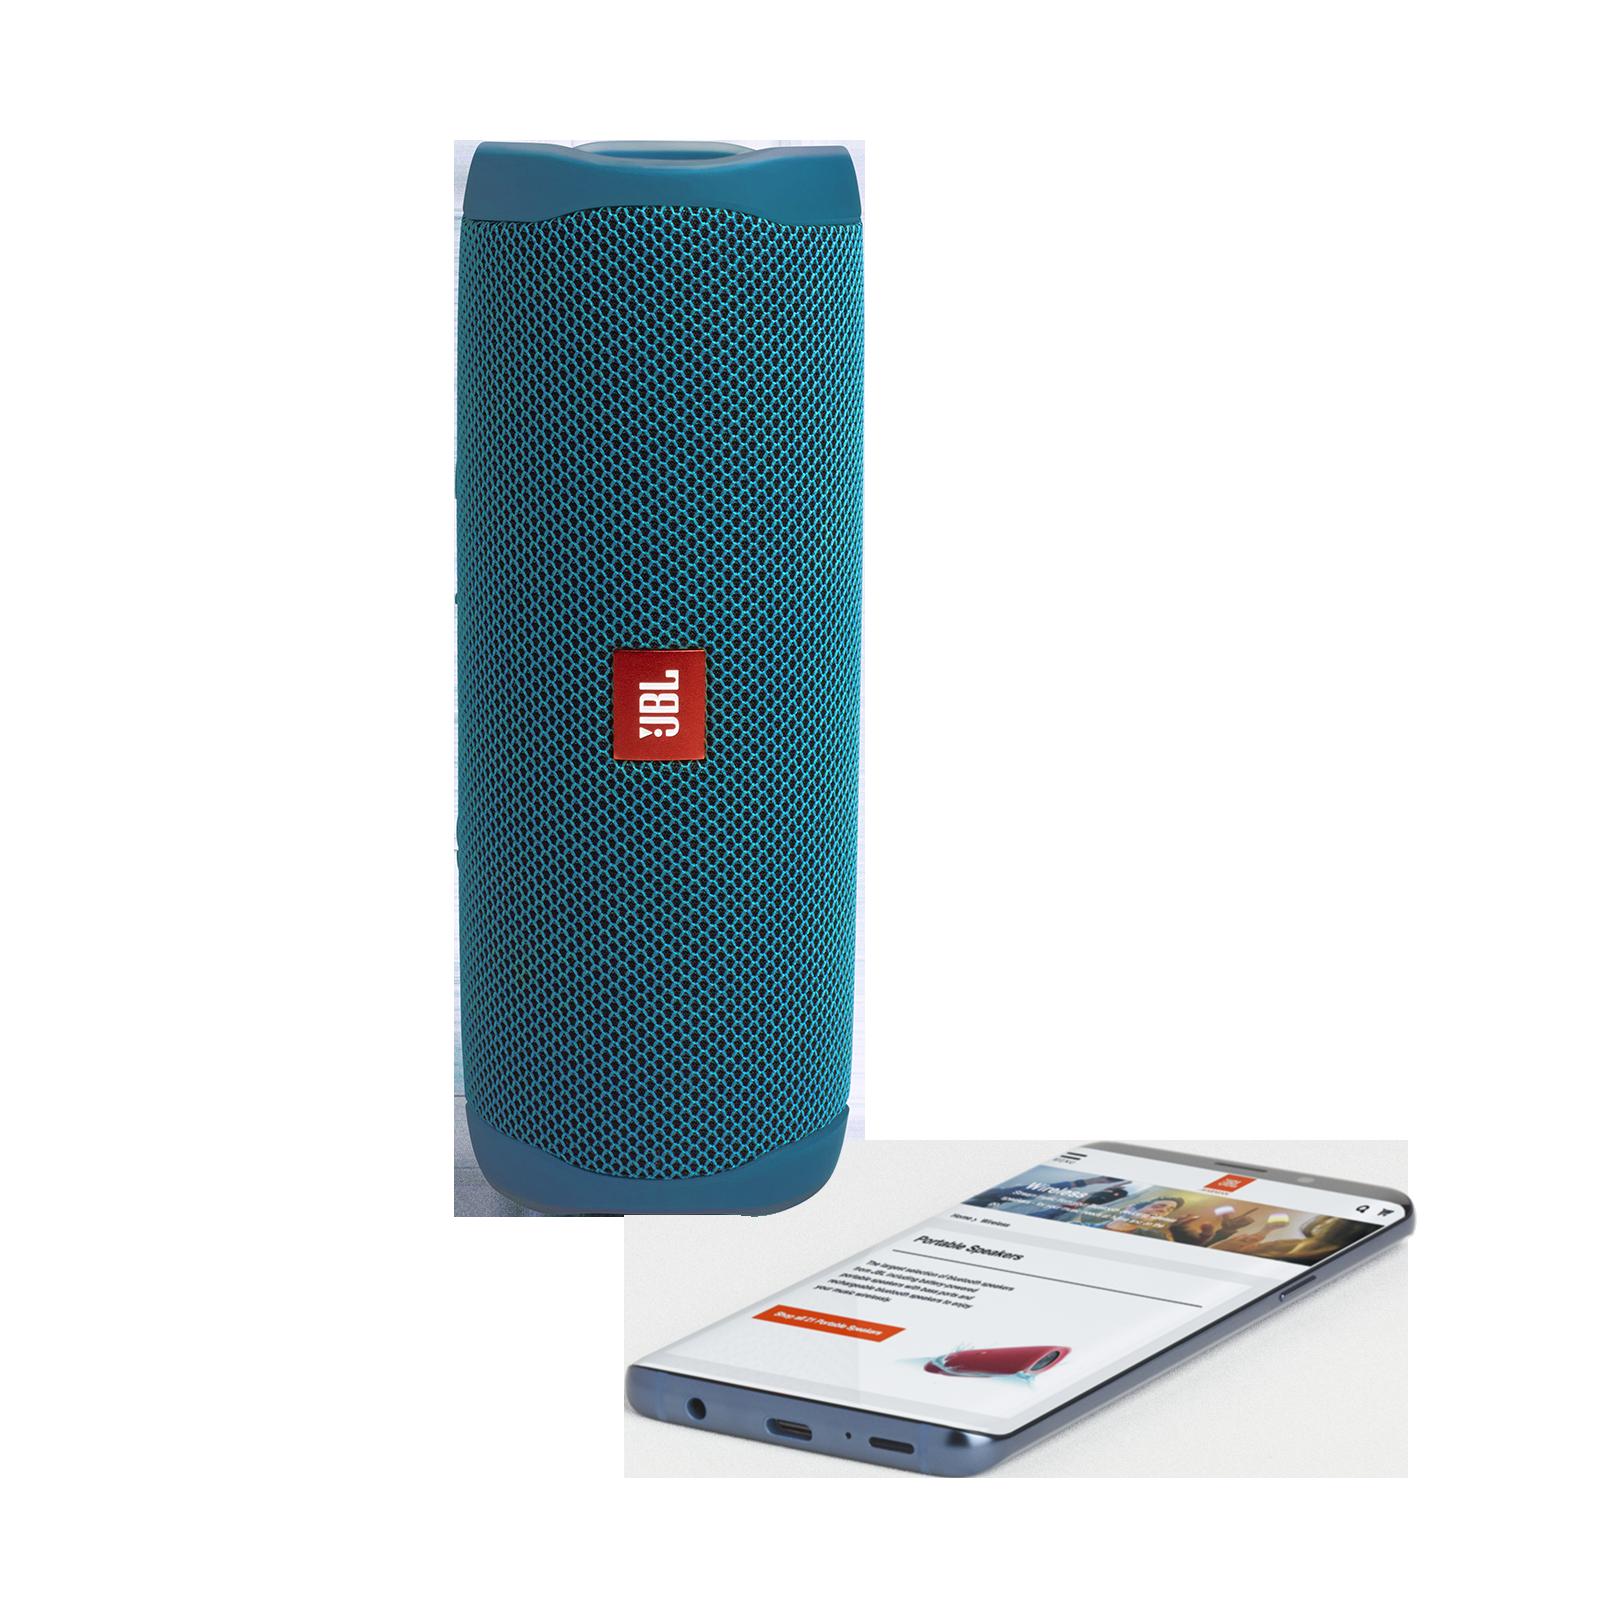 JBL Flip 5 Eco edition - Ocean Blue - Portable Speaker - Eco edition - Detailshot 1